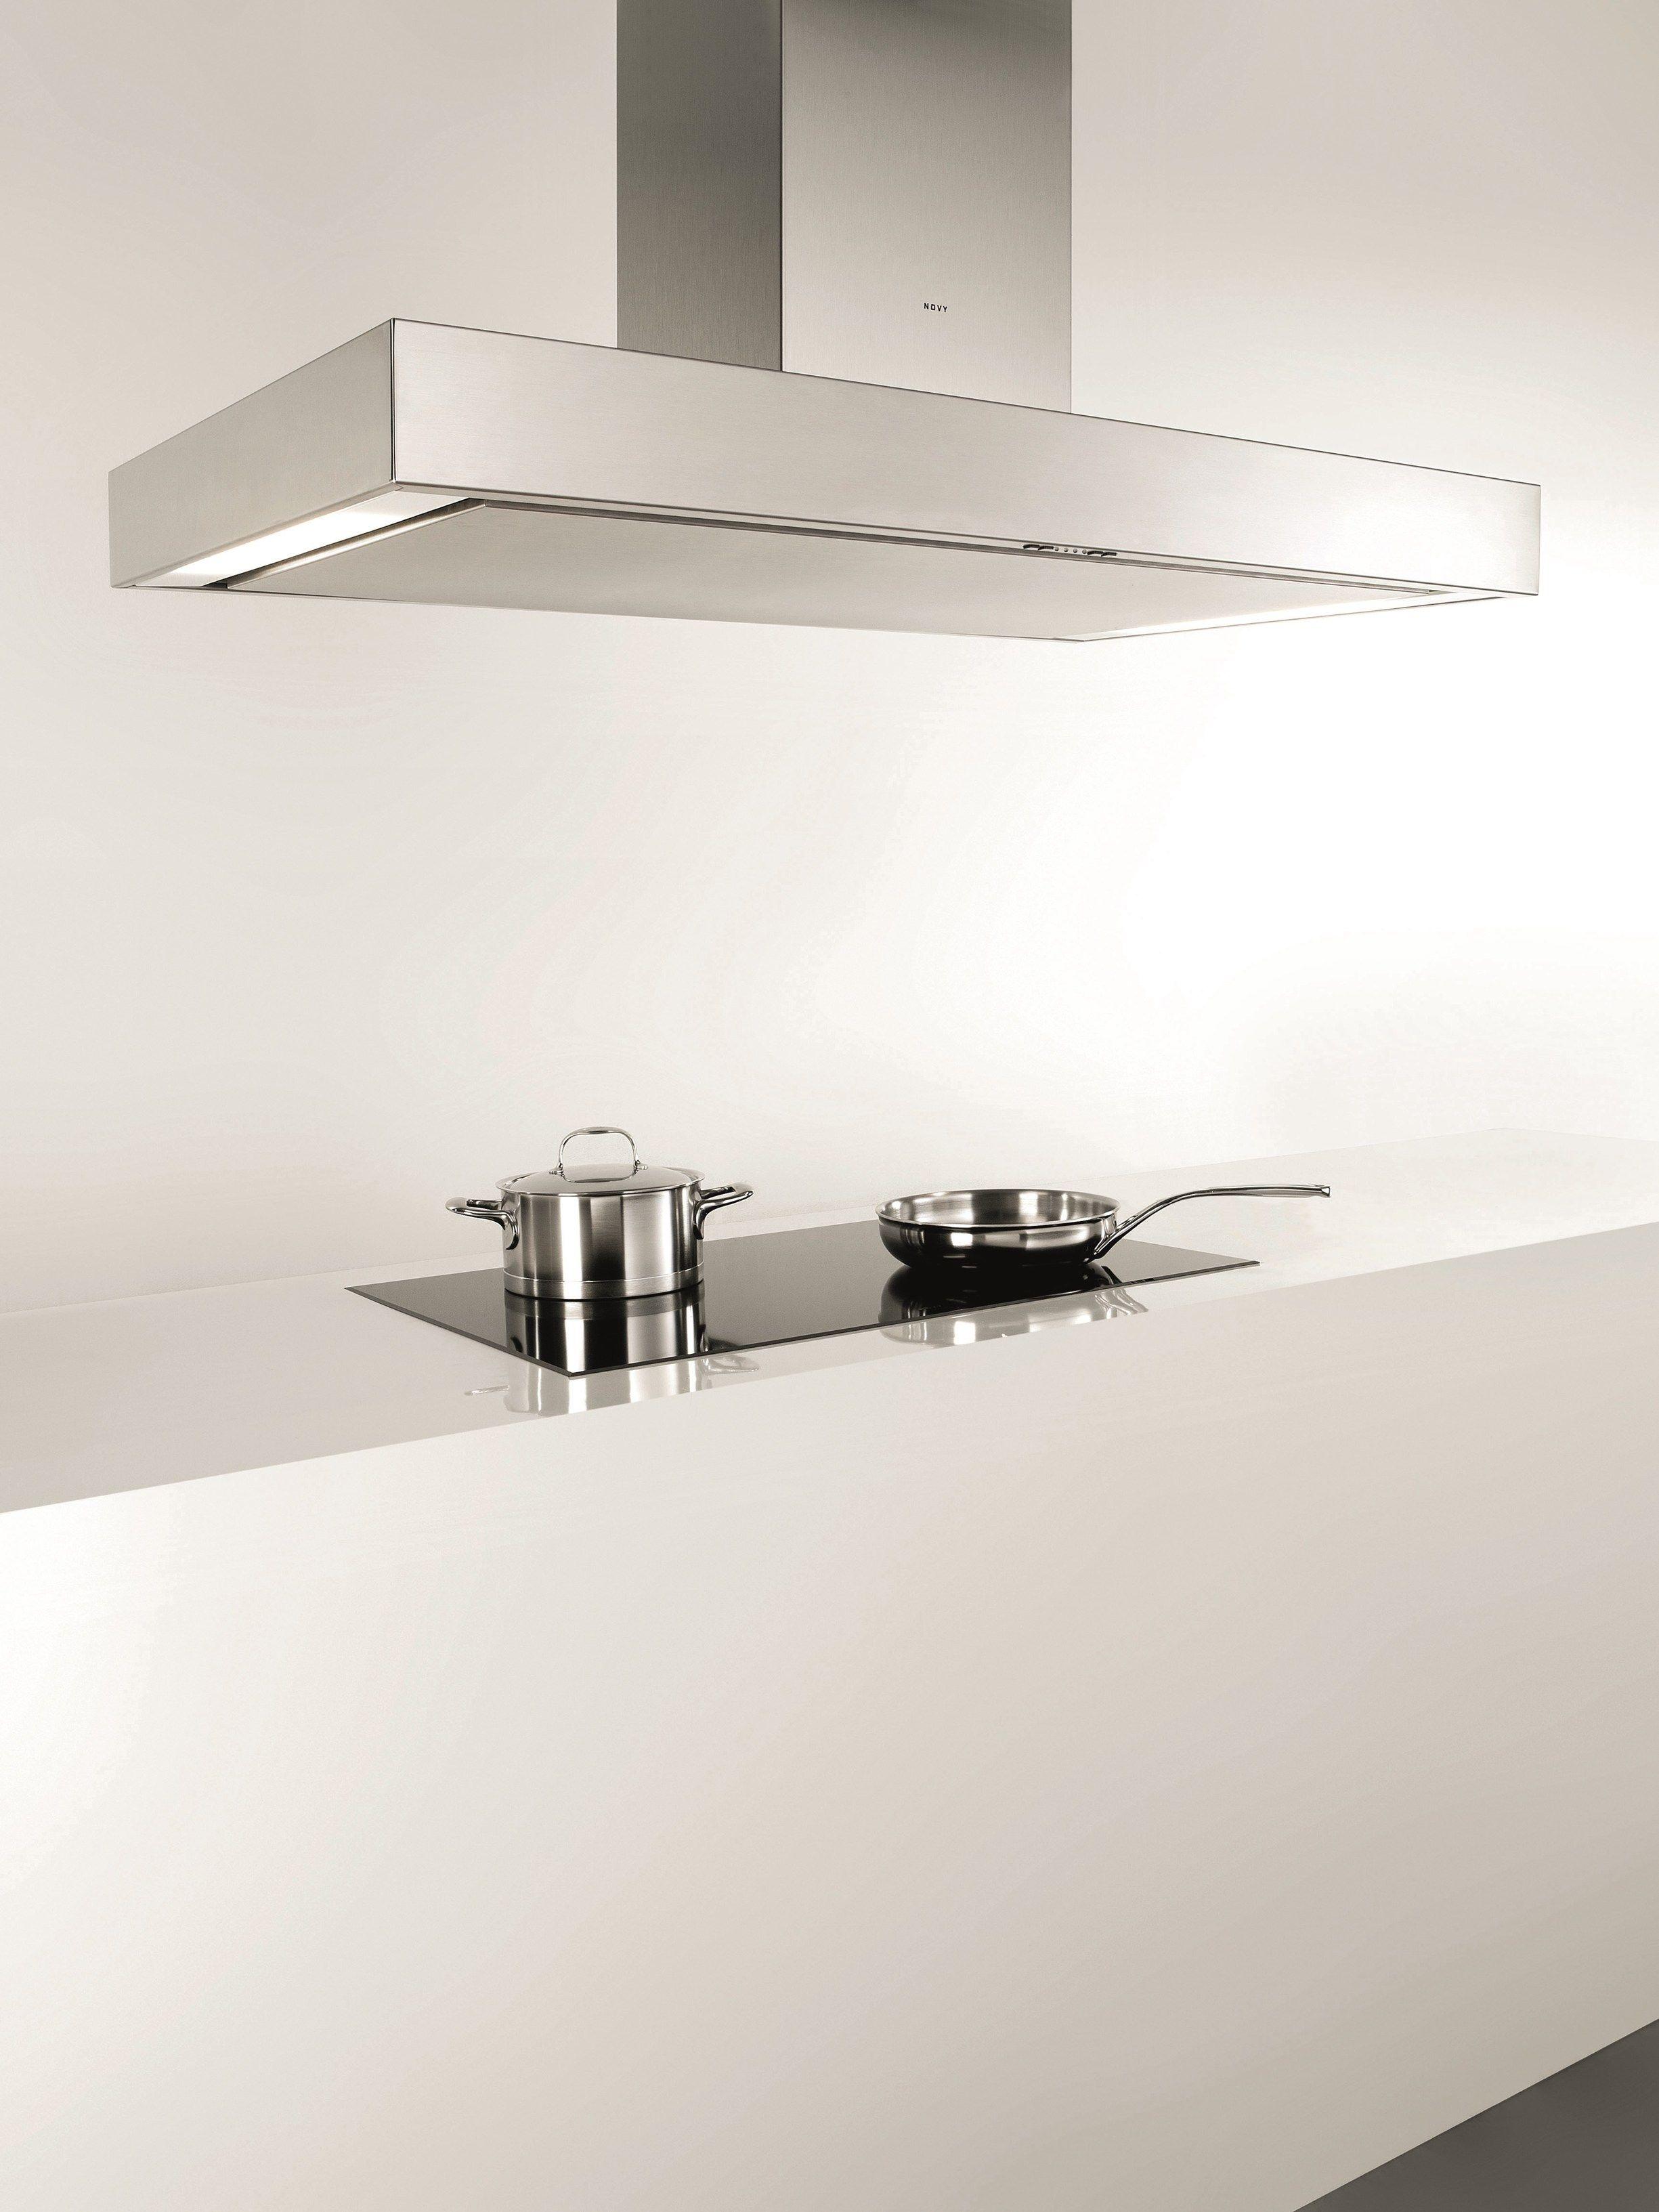 dunstabzugshaube zur wandmontage mit integrierter beleuchtung 7305 pro 39 line by novy. Black Bedroom Furniture Sets. Home Design Ideas